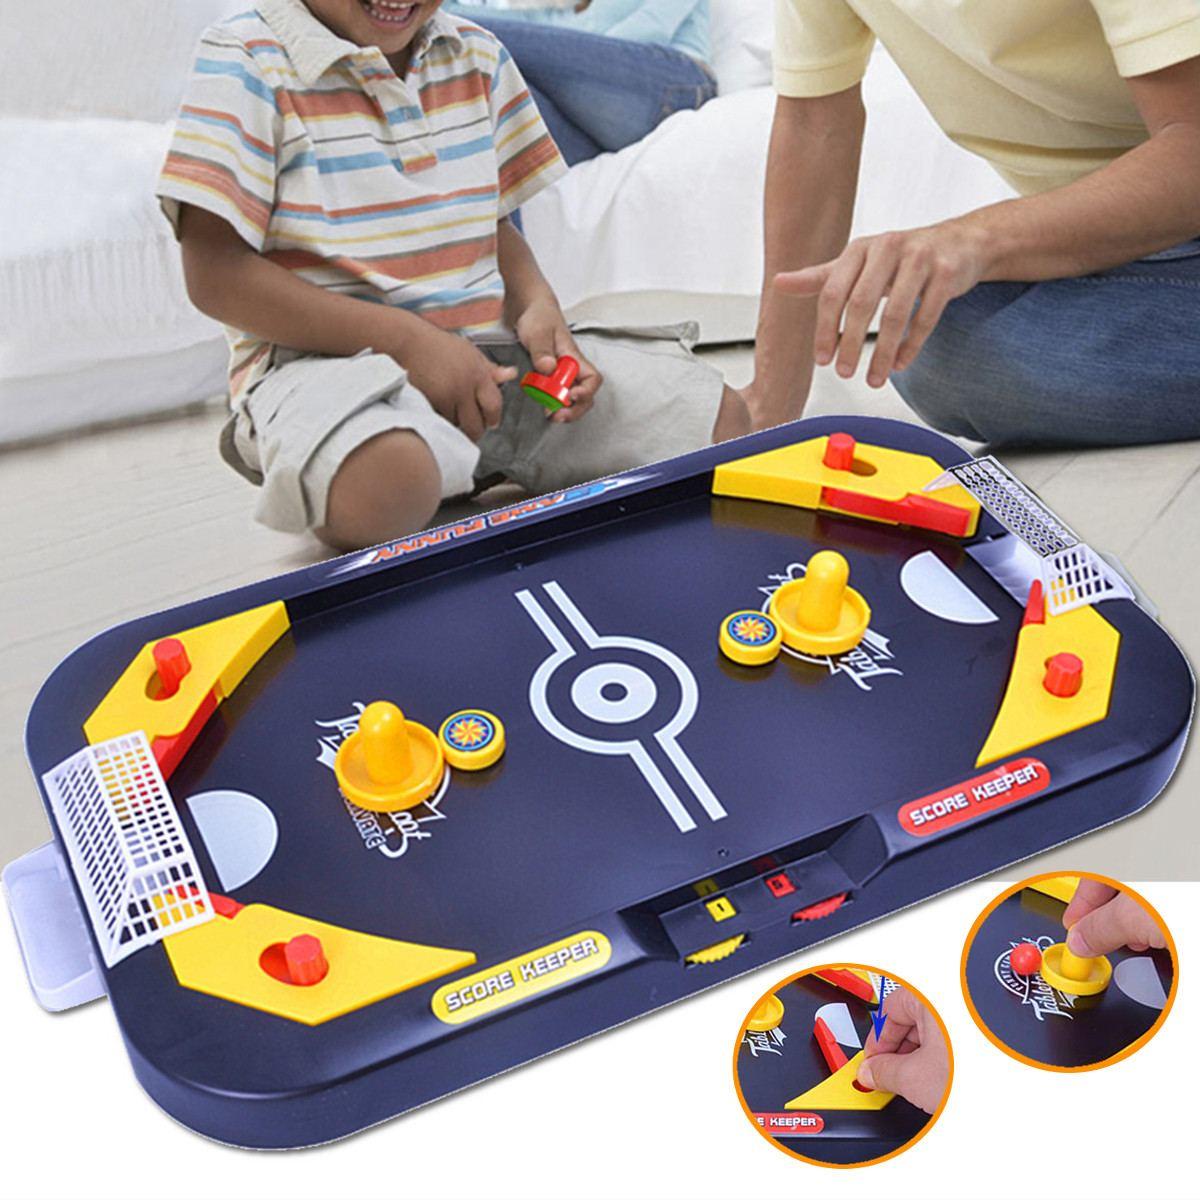 Desktop Battle 2 In 1 Ice Hockey Game Leisure Mini Air Hockey Table Children's Educational Interactive Toys Gift Indoor Sport